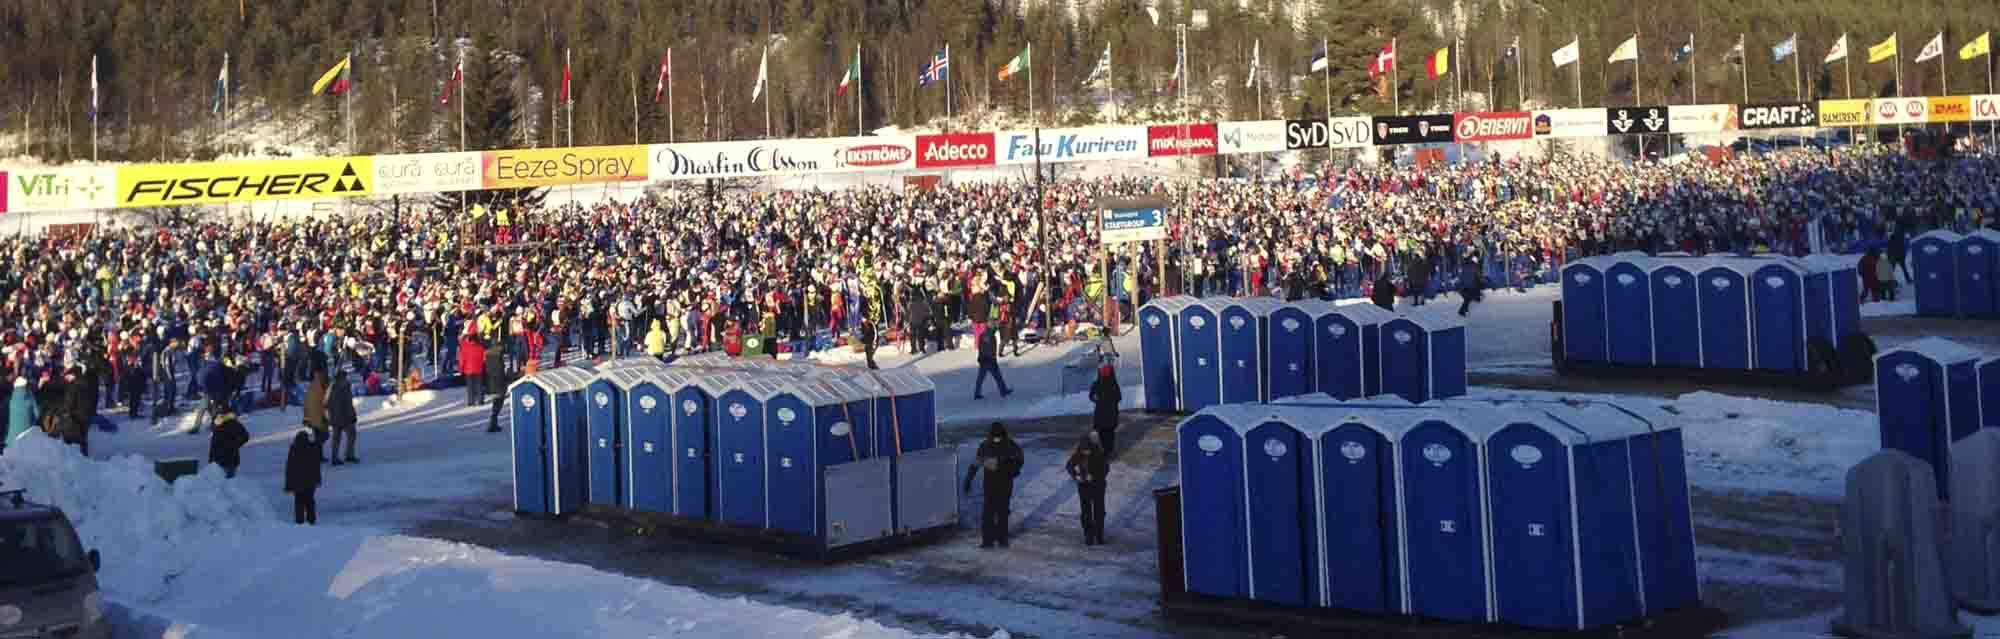 Vasaloppet Sälen -SeBra Event AB